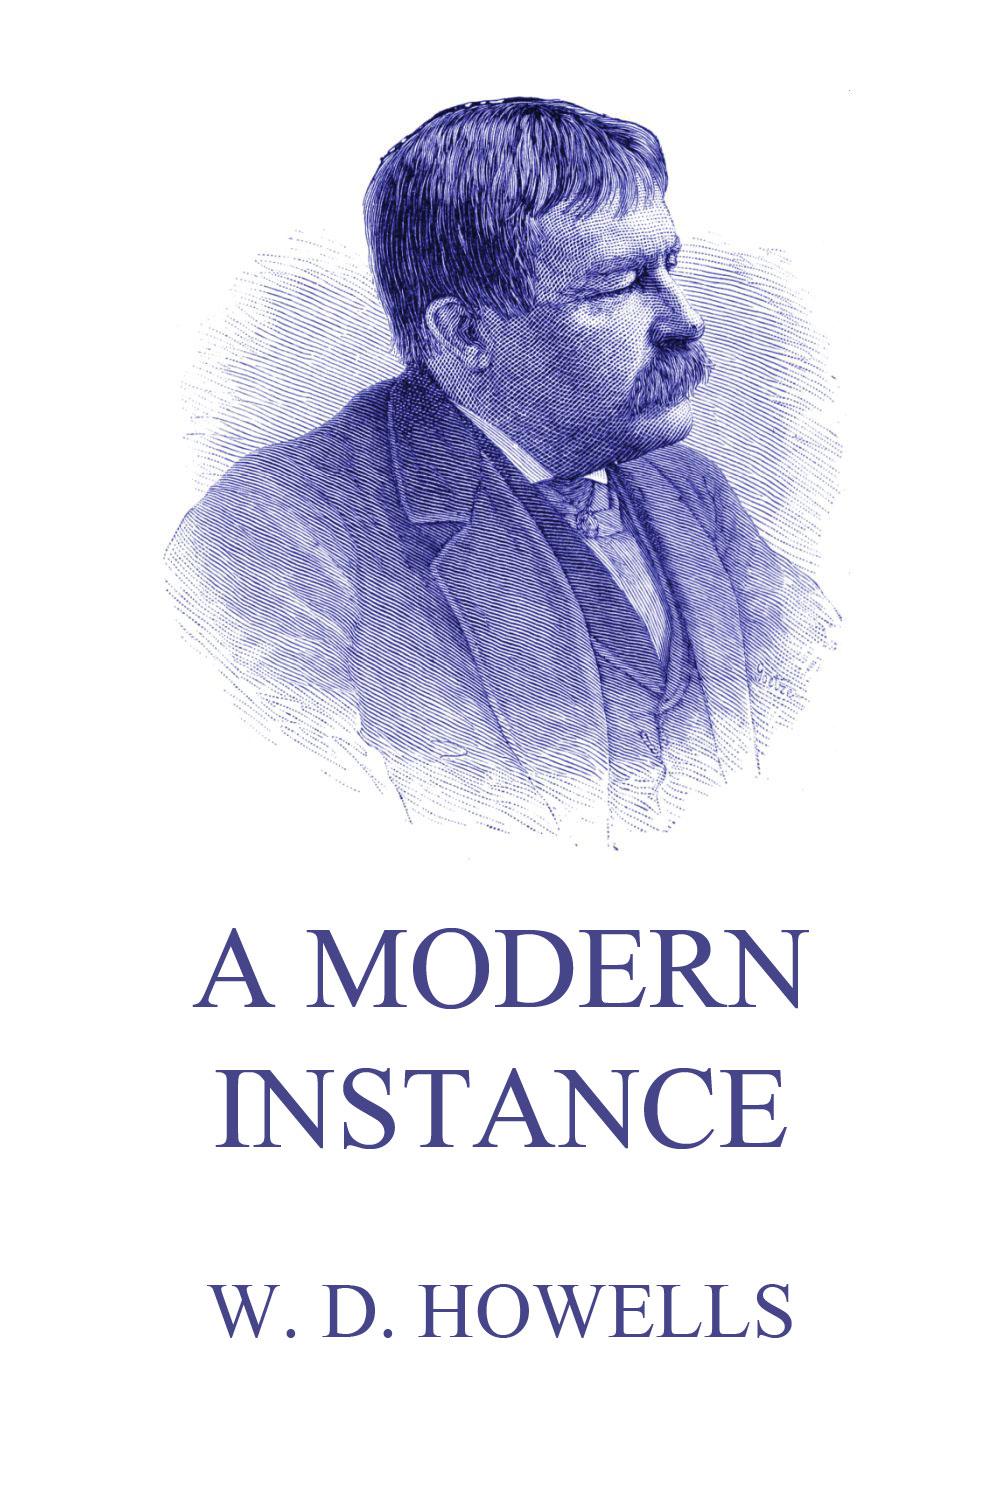 William Dean Howells A Modern Instance